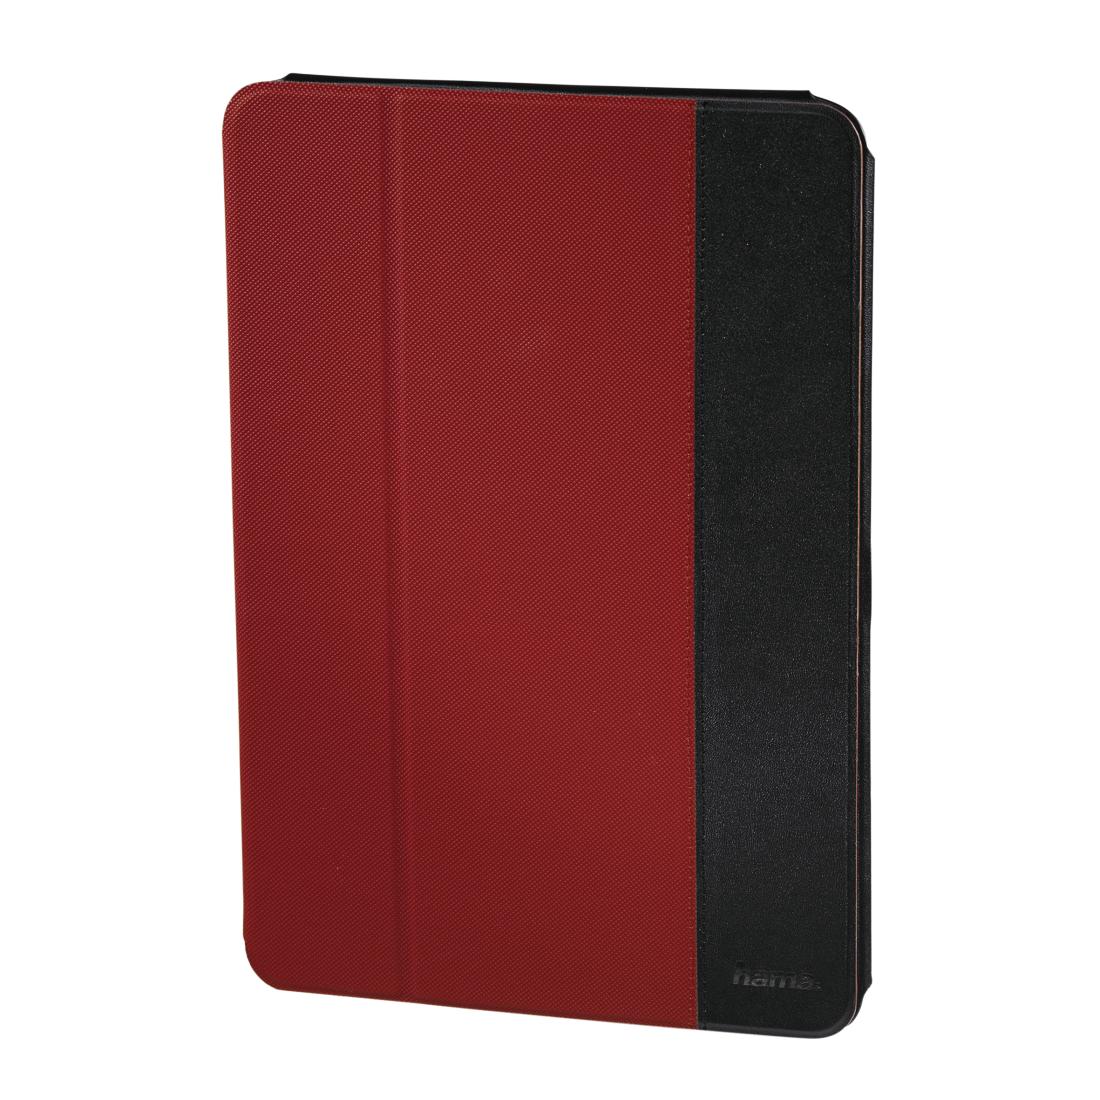 Nexus 10 User Manual Ebook Mito Fantasy A99 Android Jellybean Array Hama Com 00108246 Flipcase Portfolio For Google